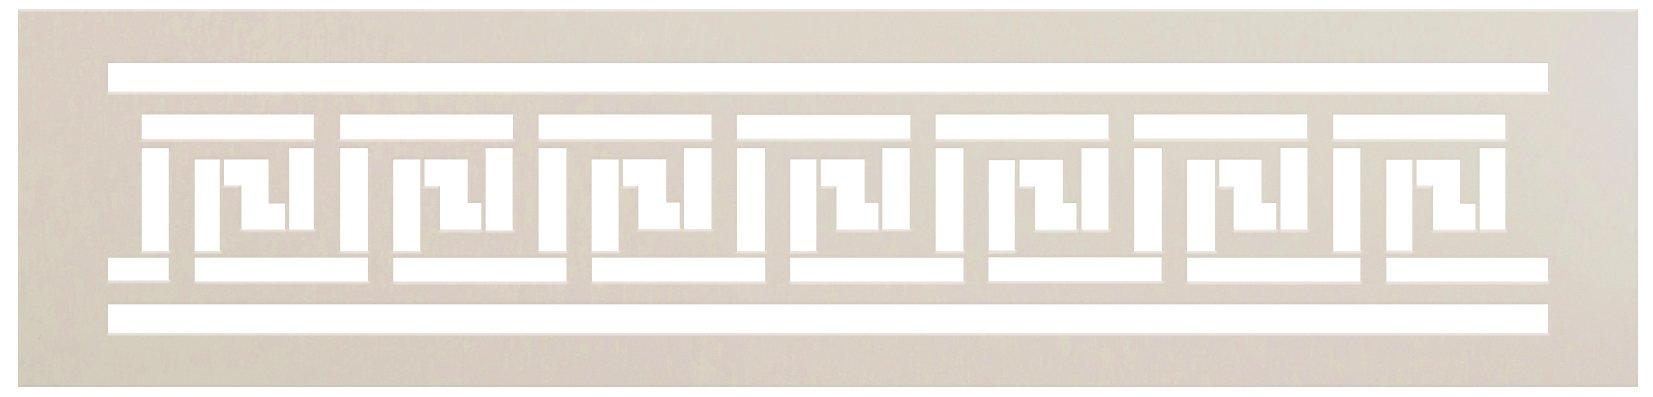 Greek Key Meander Wall Tile Stencil by StudioR12 | DIY Backsplash Border Floor Home Decor | Craft & Paint Wood Sign | Reusable Mylar Template | Select Size